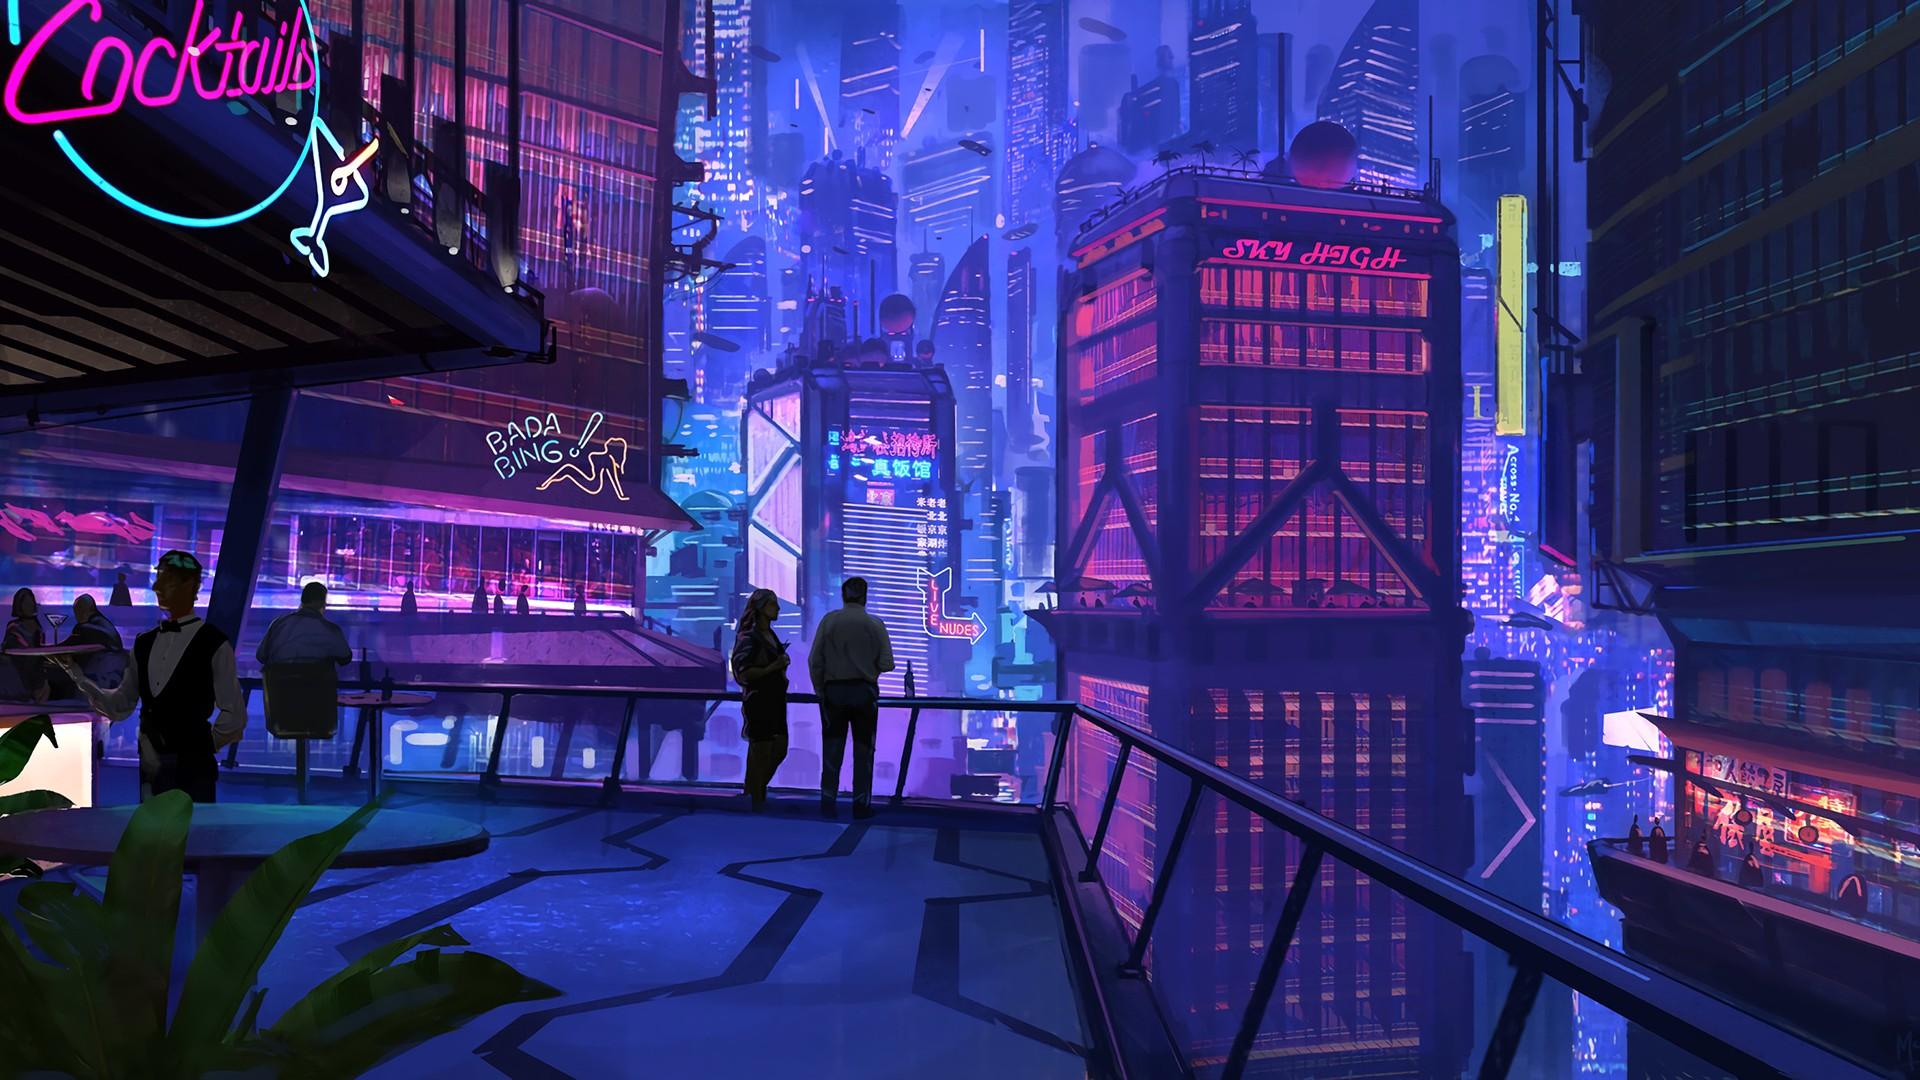 Wallpaper : 1920x1080 px, cityscape, cyberpunk, digital ...